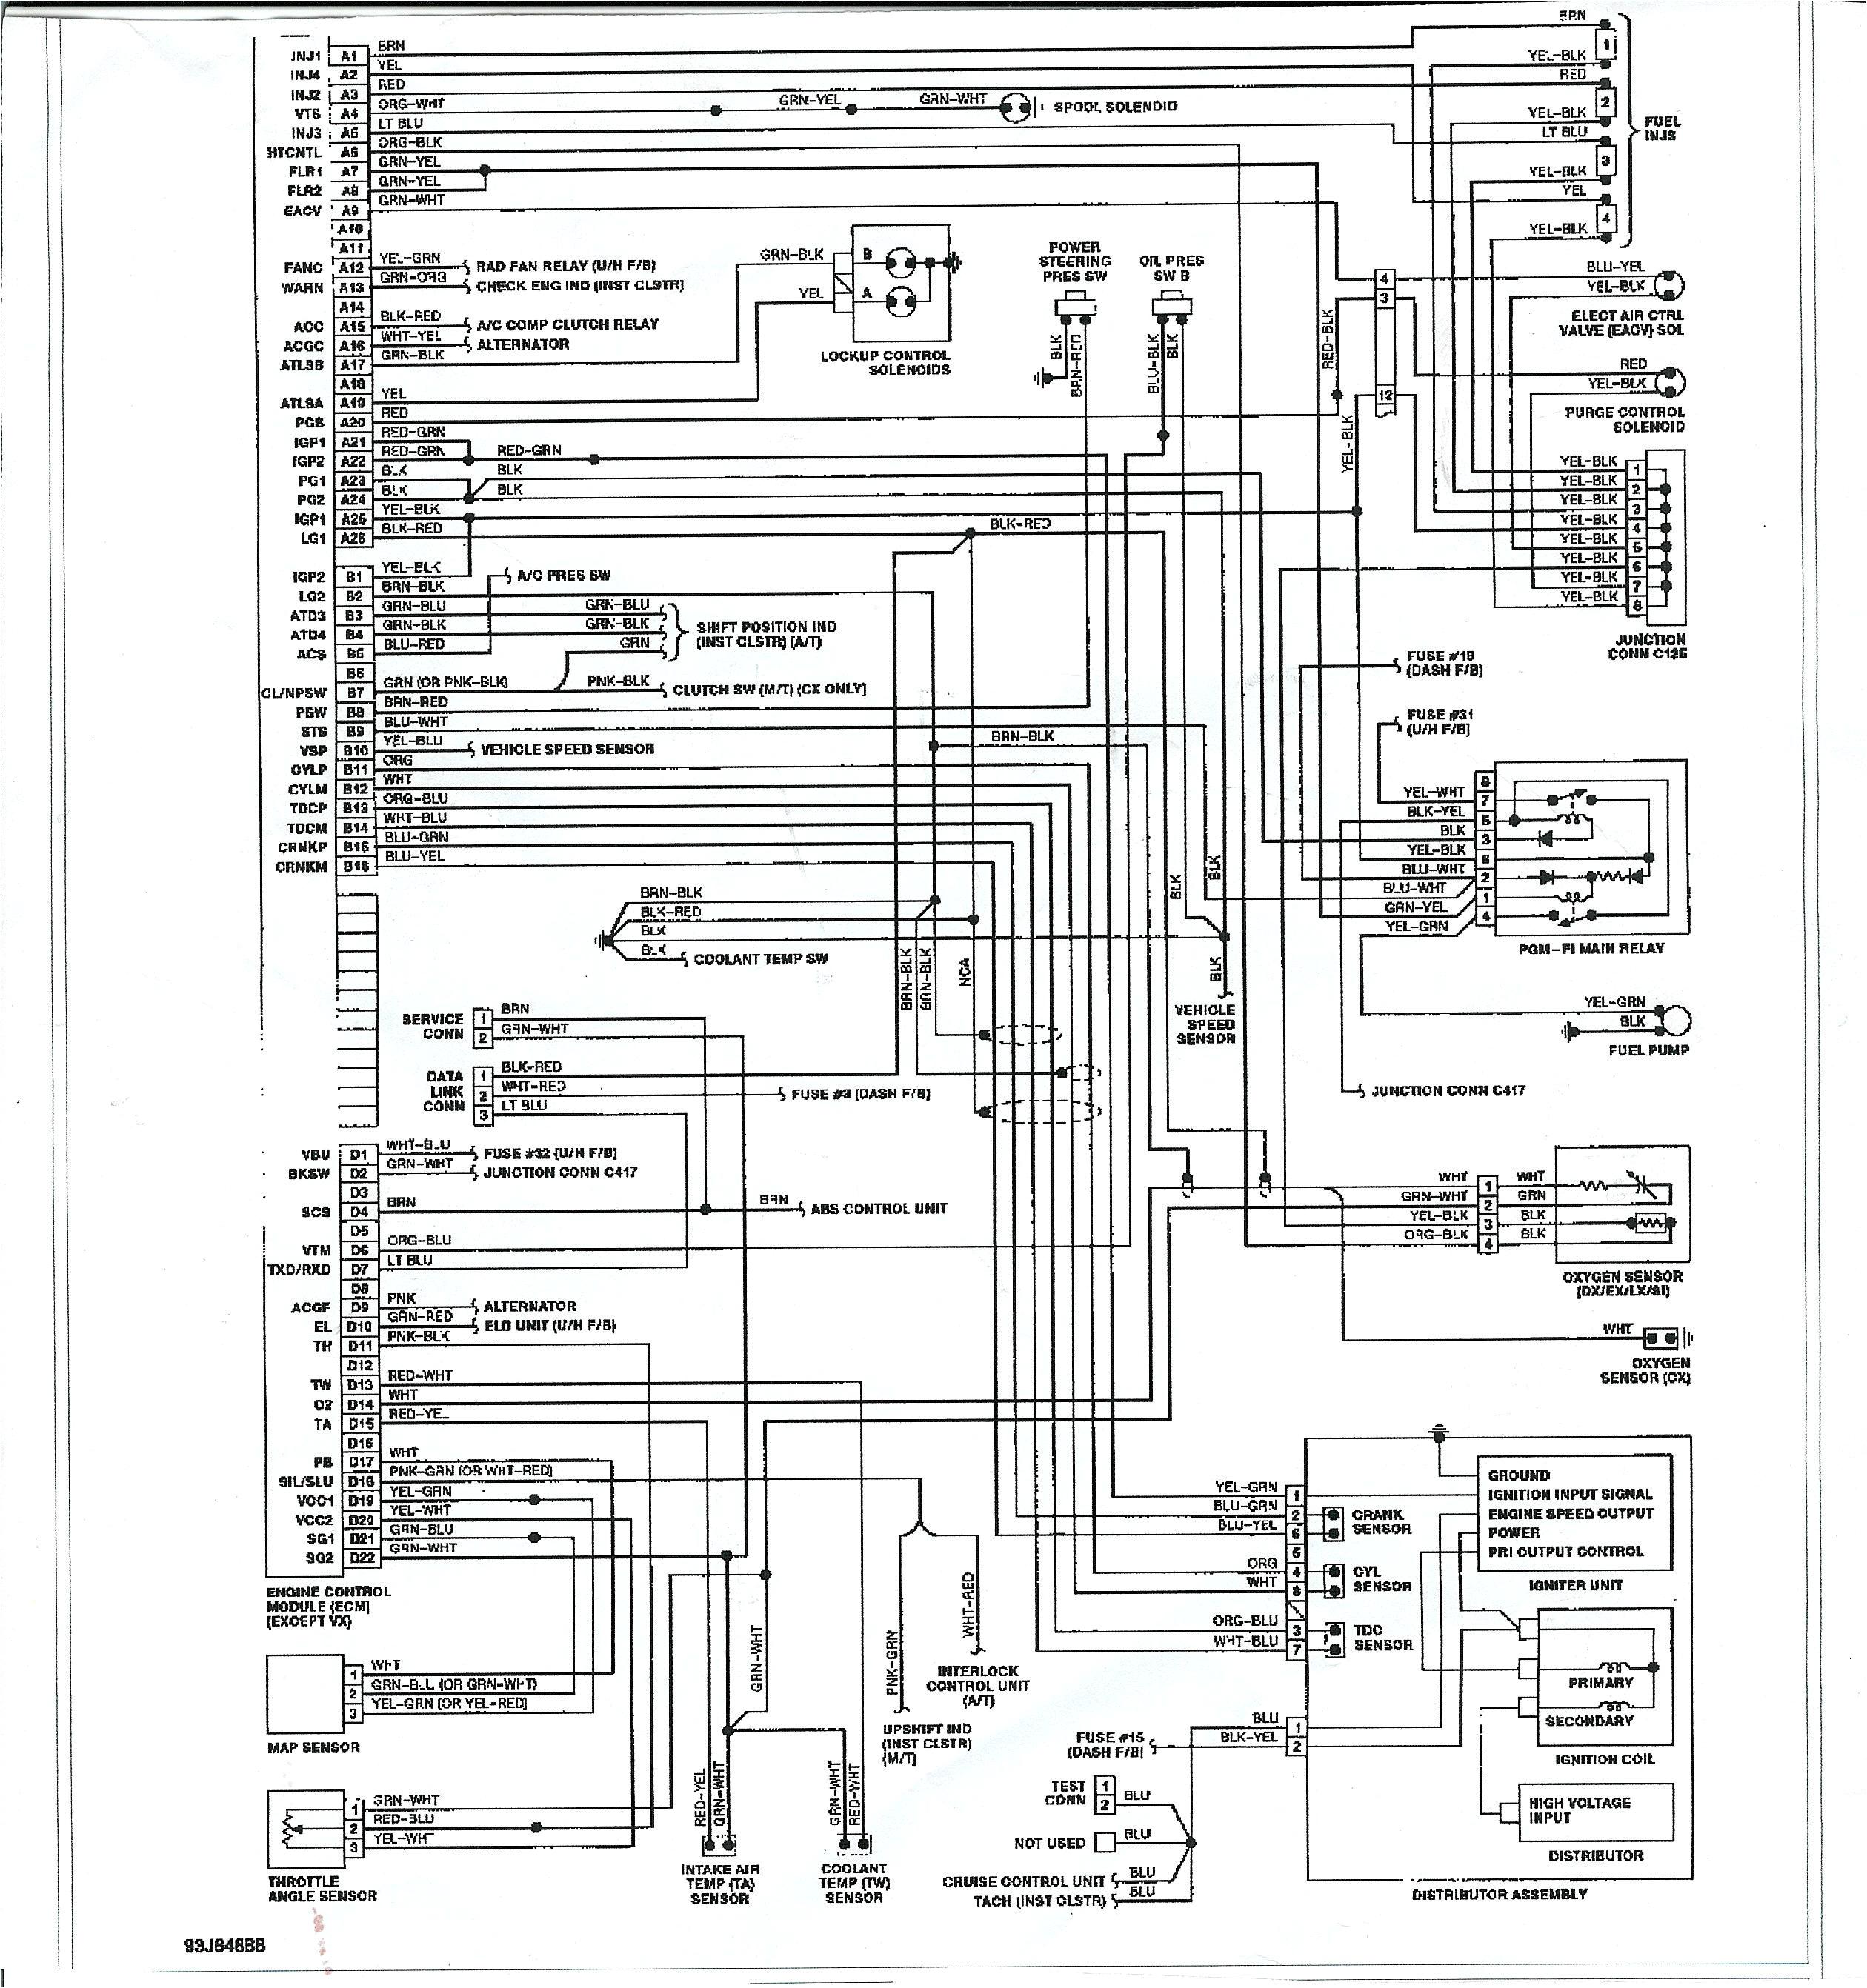 92 civic ecu wiring diagram wiring diagram datasource 92 civic radio wiring diagram 92 civic wiring diagram